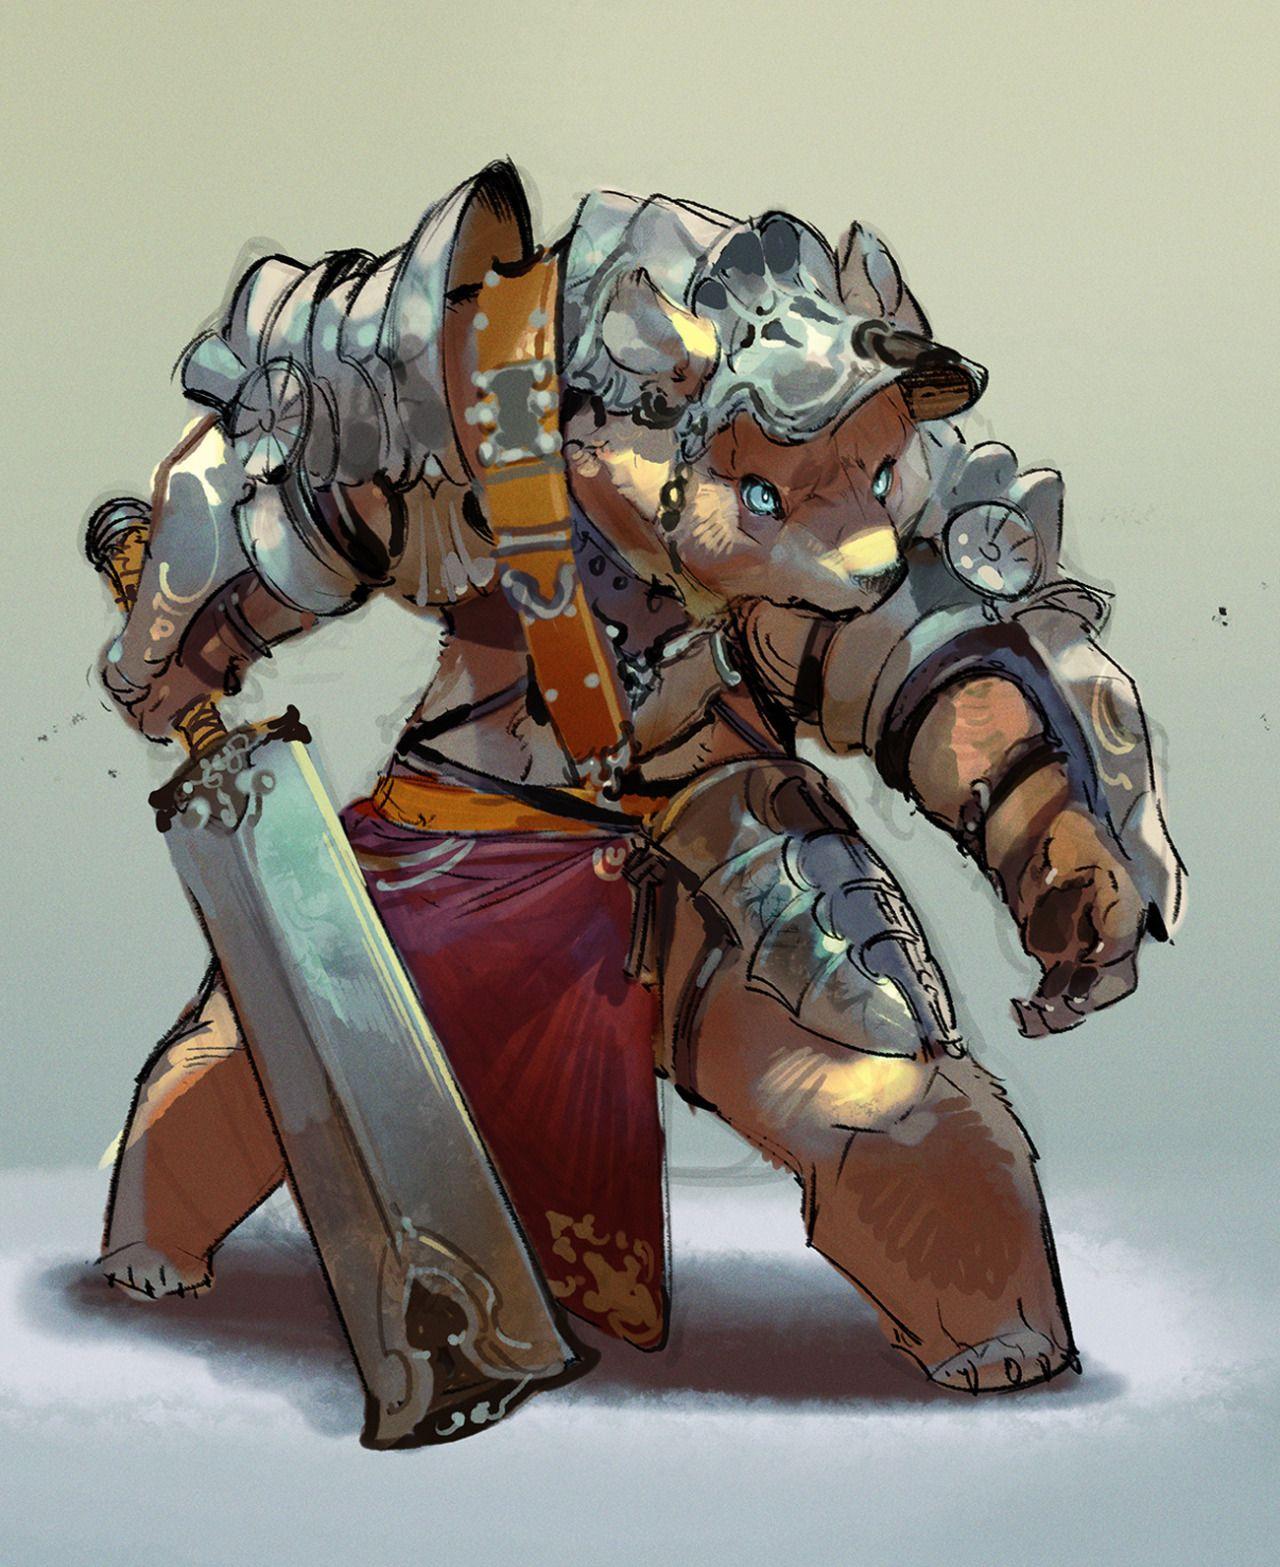 Yuck Character Design : The art of animation ryota murayama knights armor